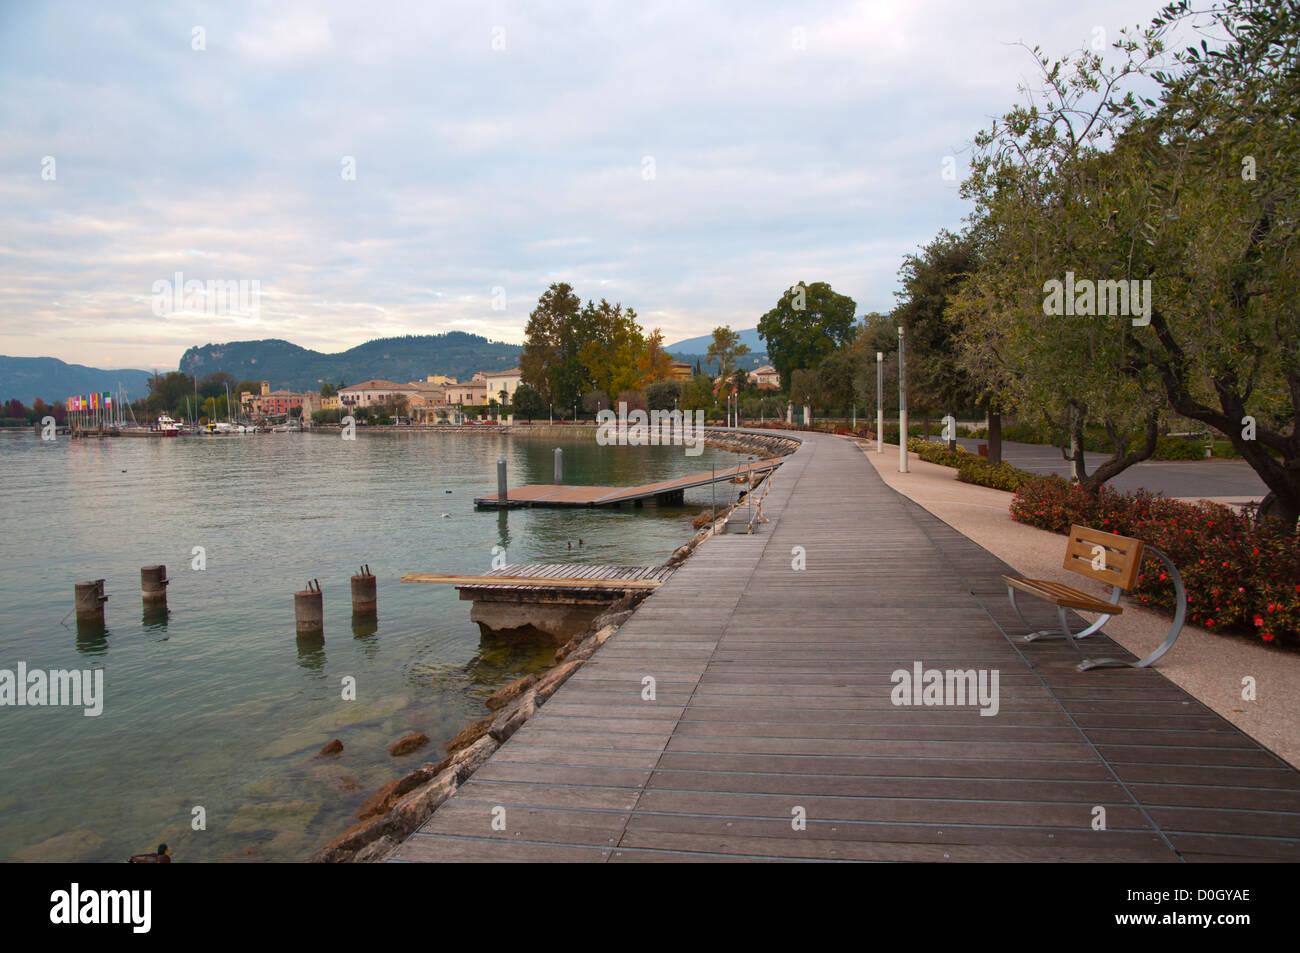 Lakeside promenade during autumn Bardelino town Lago di Garda the Garda Lake the Veneto region Italy Europe Stock Photo